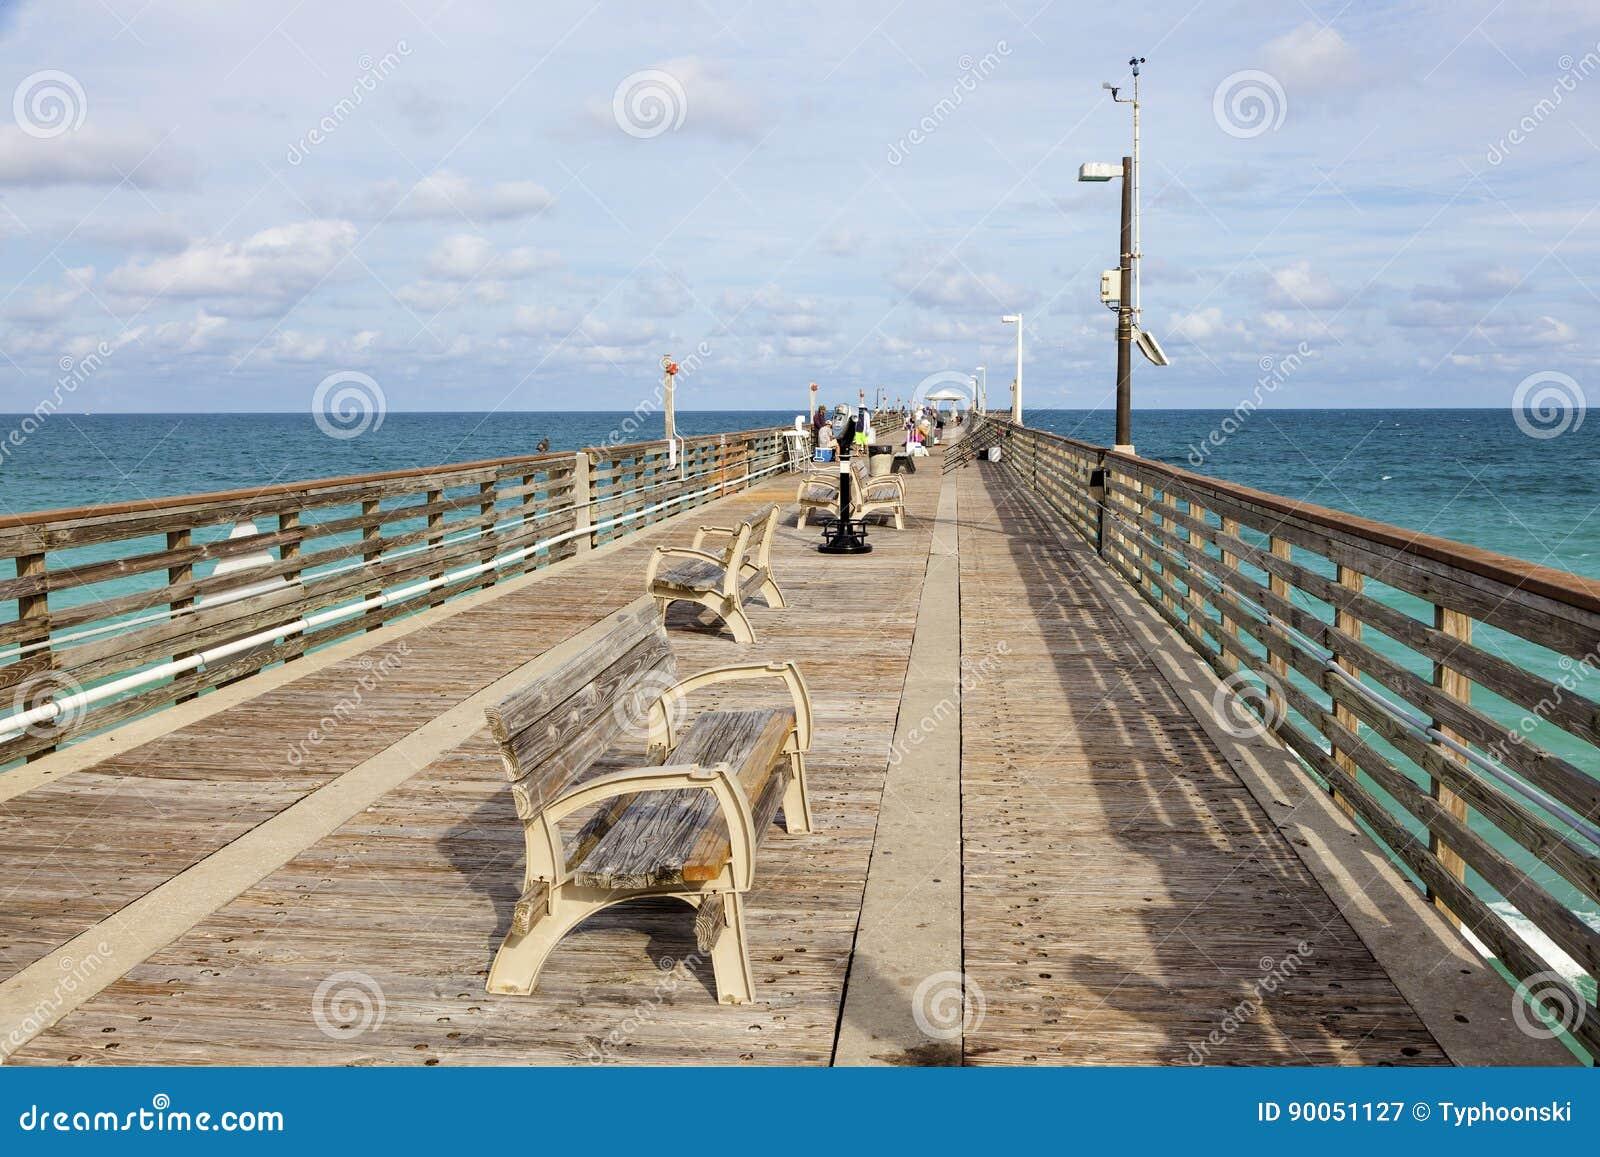 Dania Beach Fishing Pier Florida Editorial Photography Image Of